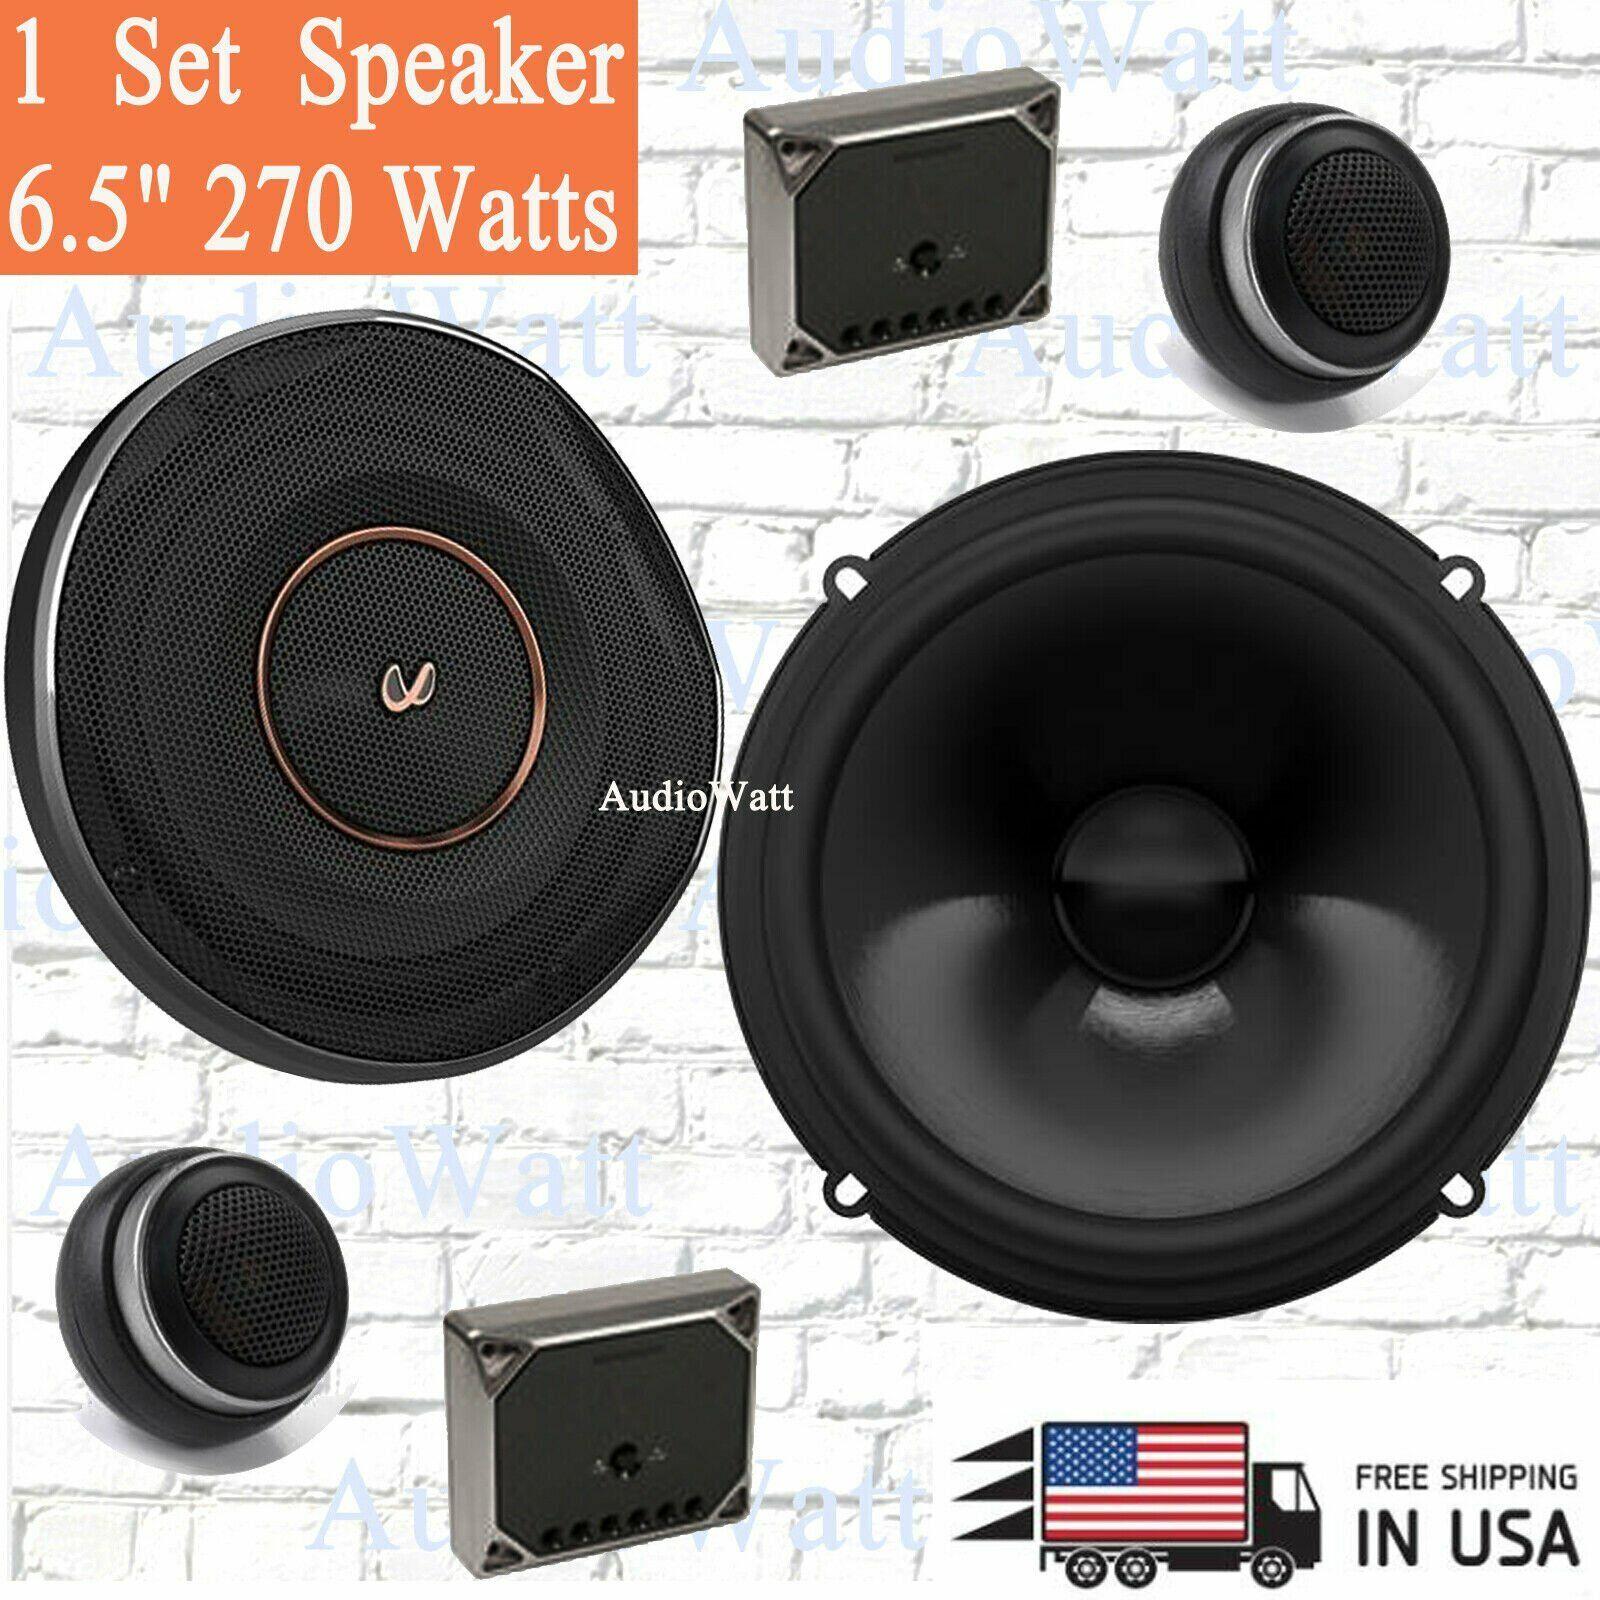 Car Speaker System >> Pair Infinity Ref 6520cx 6 5 270 Watts Component Car Speaker System